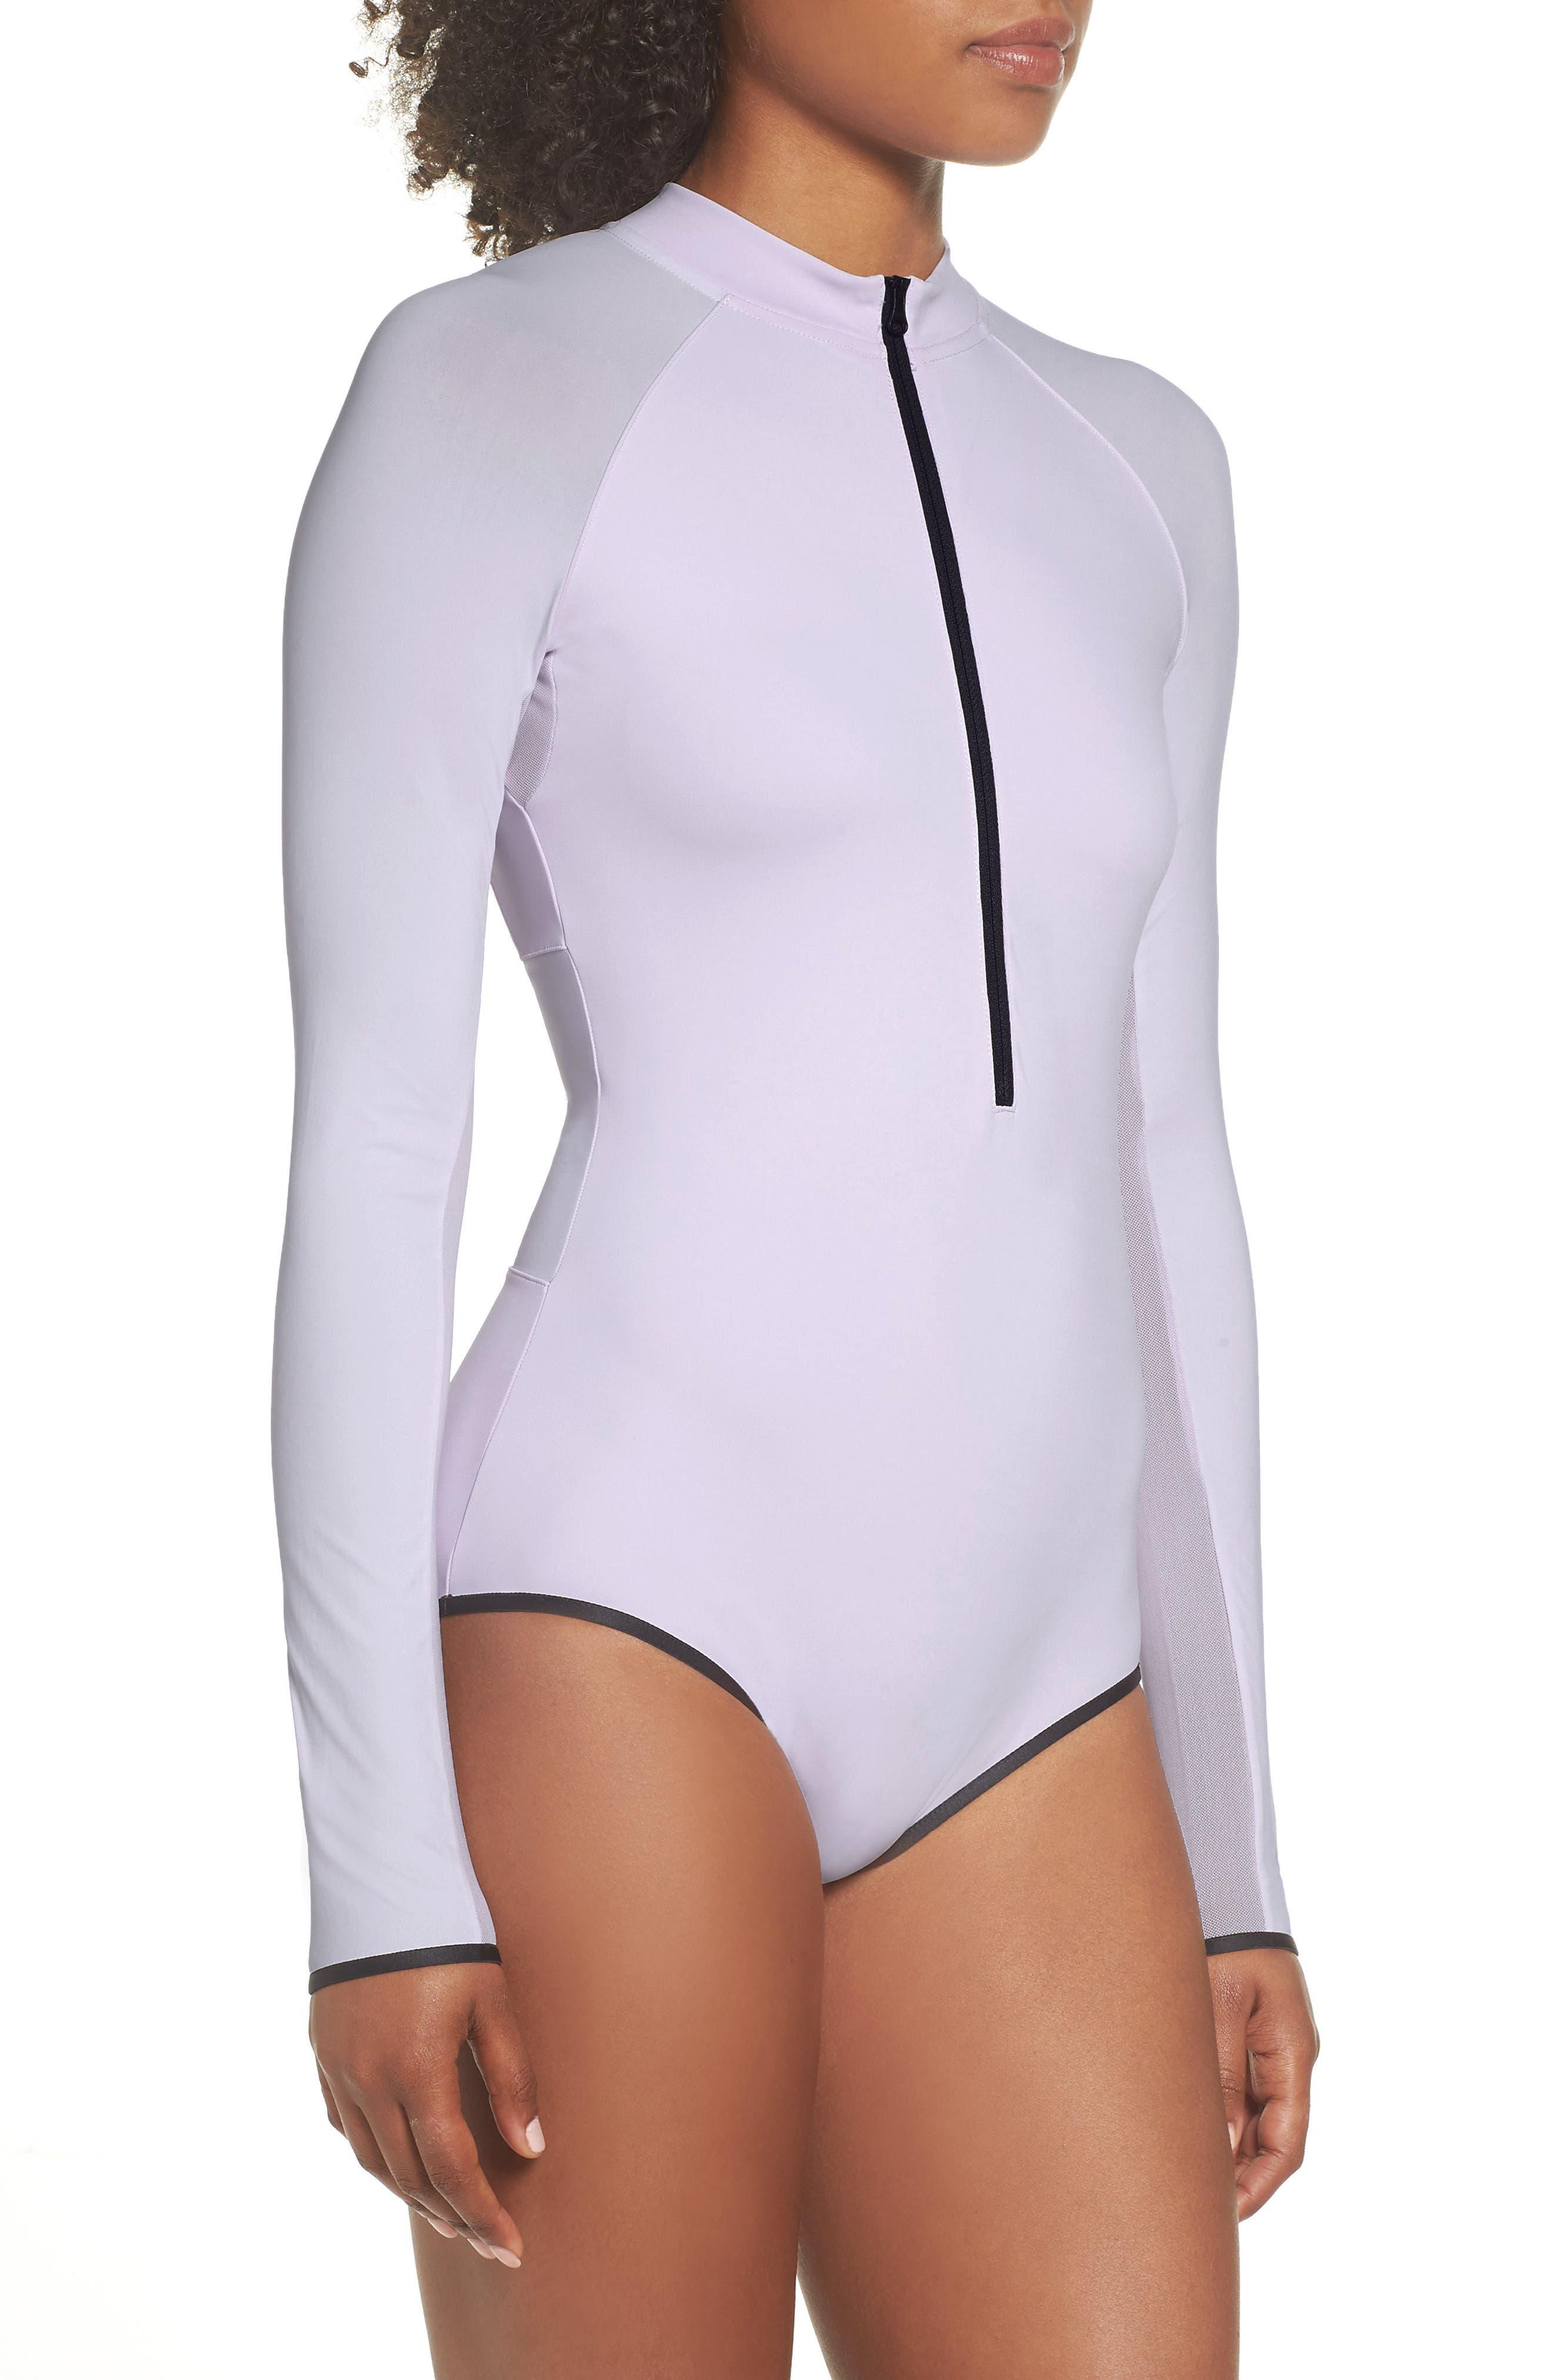 NRG Women's Dri-FIT Long Sleeve Bodysuit,                             Alternate thumbnail 4, color,                             BARELY GRAPE/ BARELY GRAPE